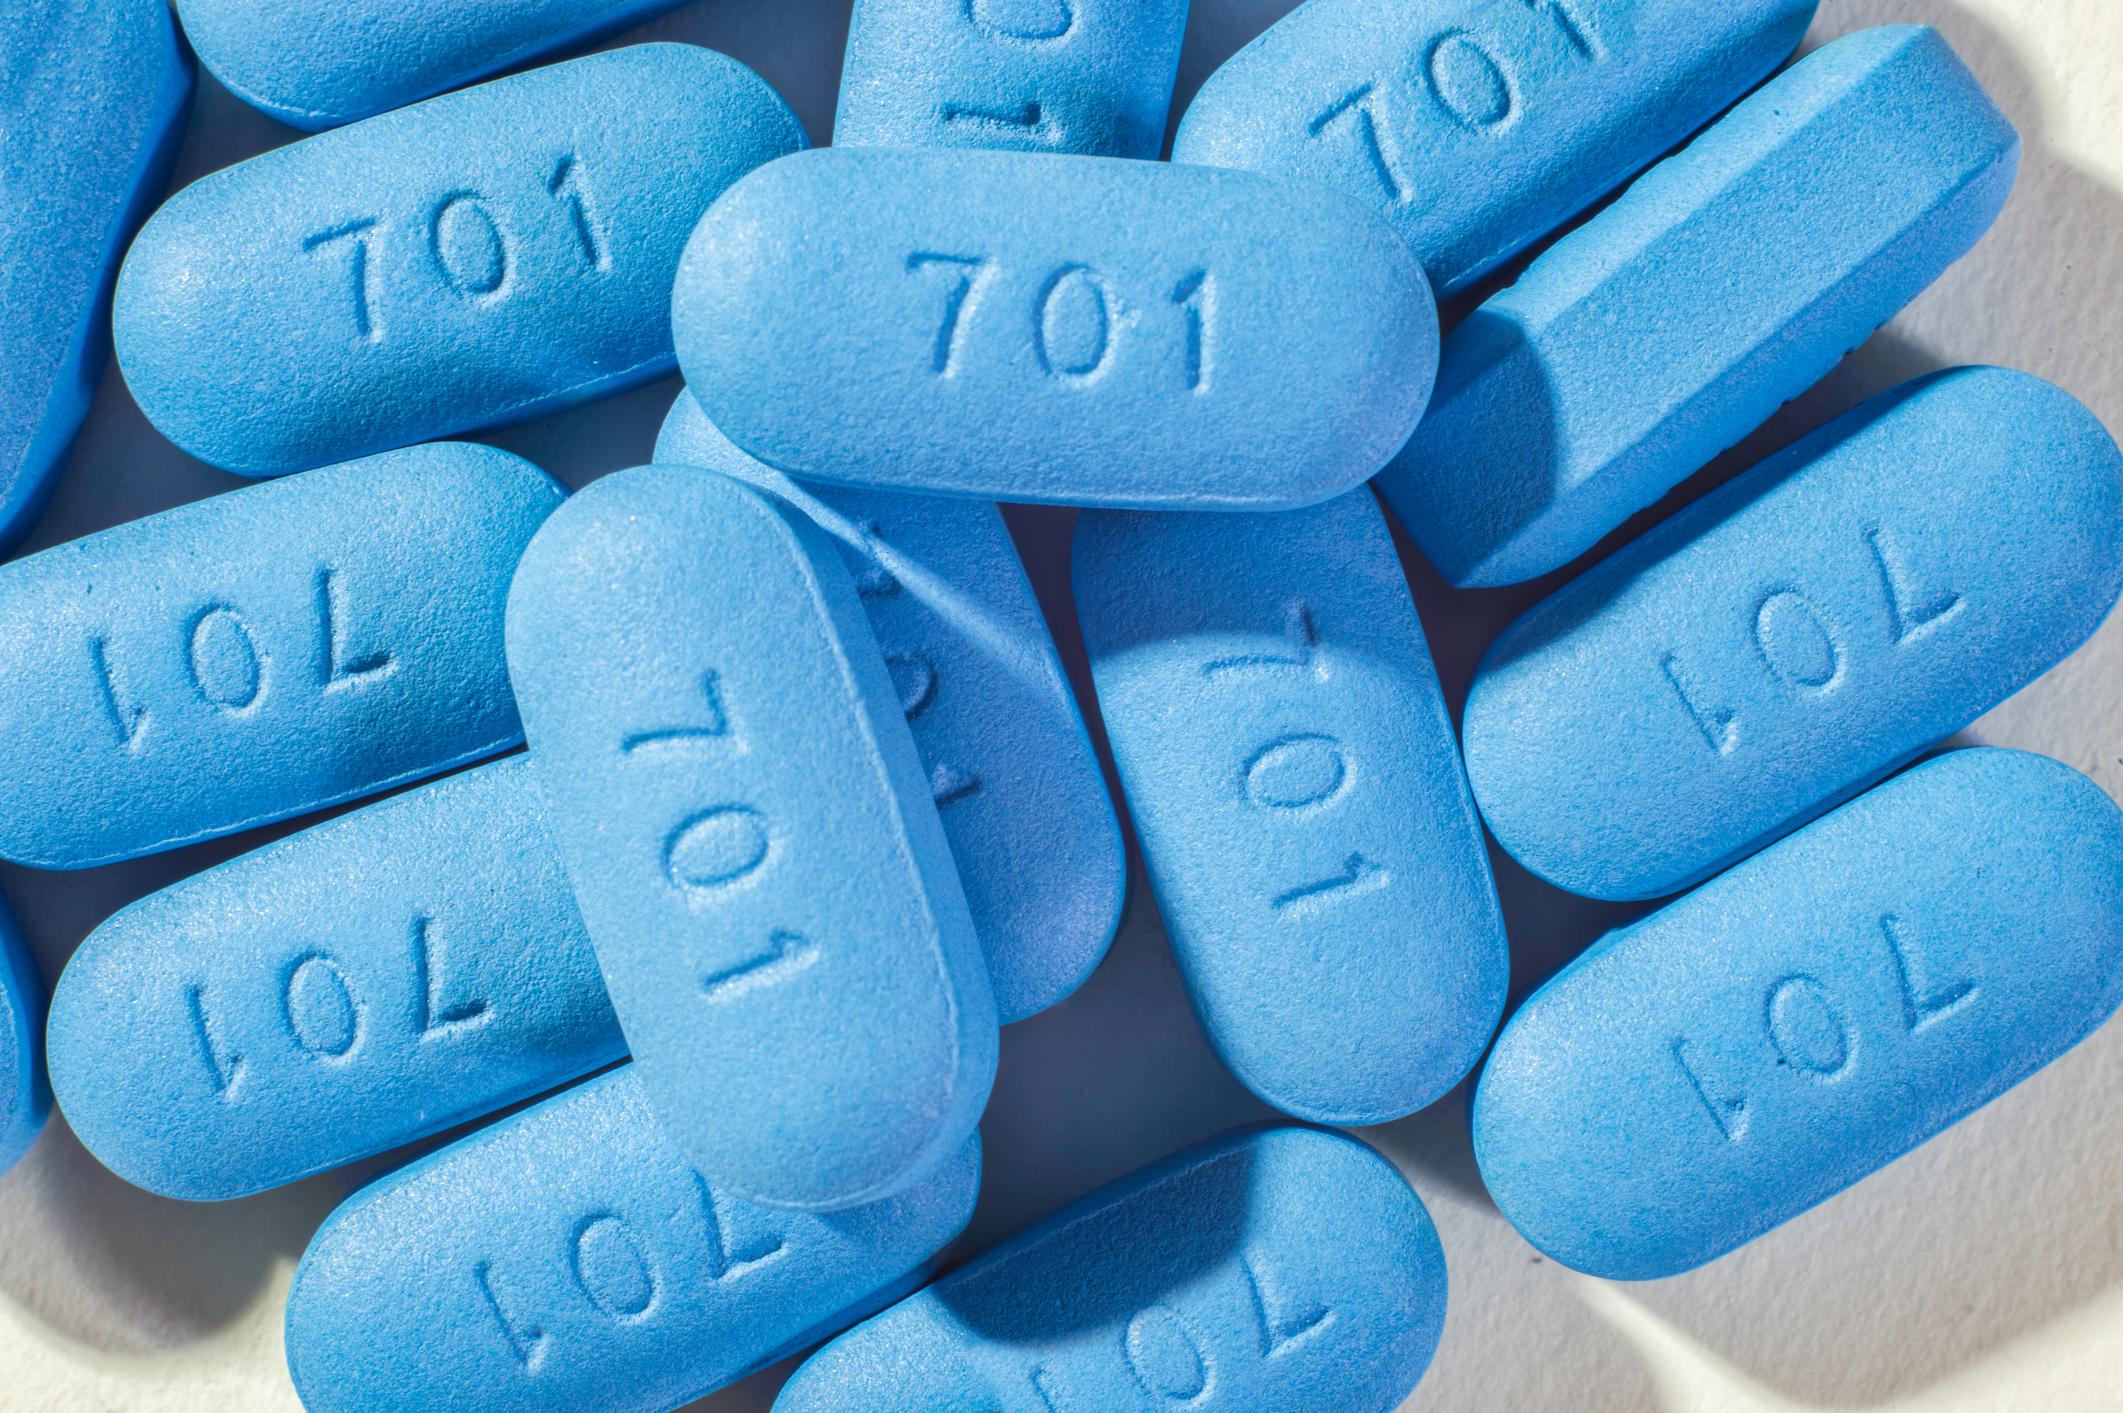 A pile of Gilead Sciences' Truvada pills.